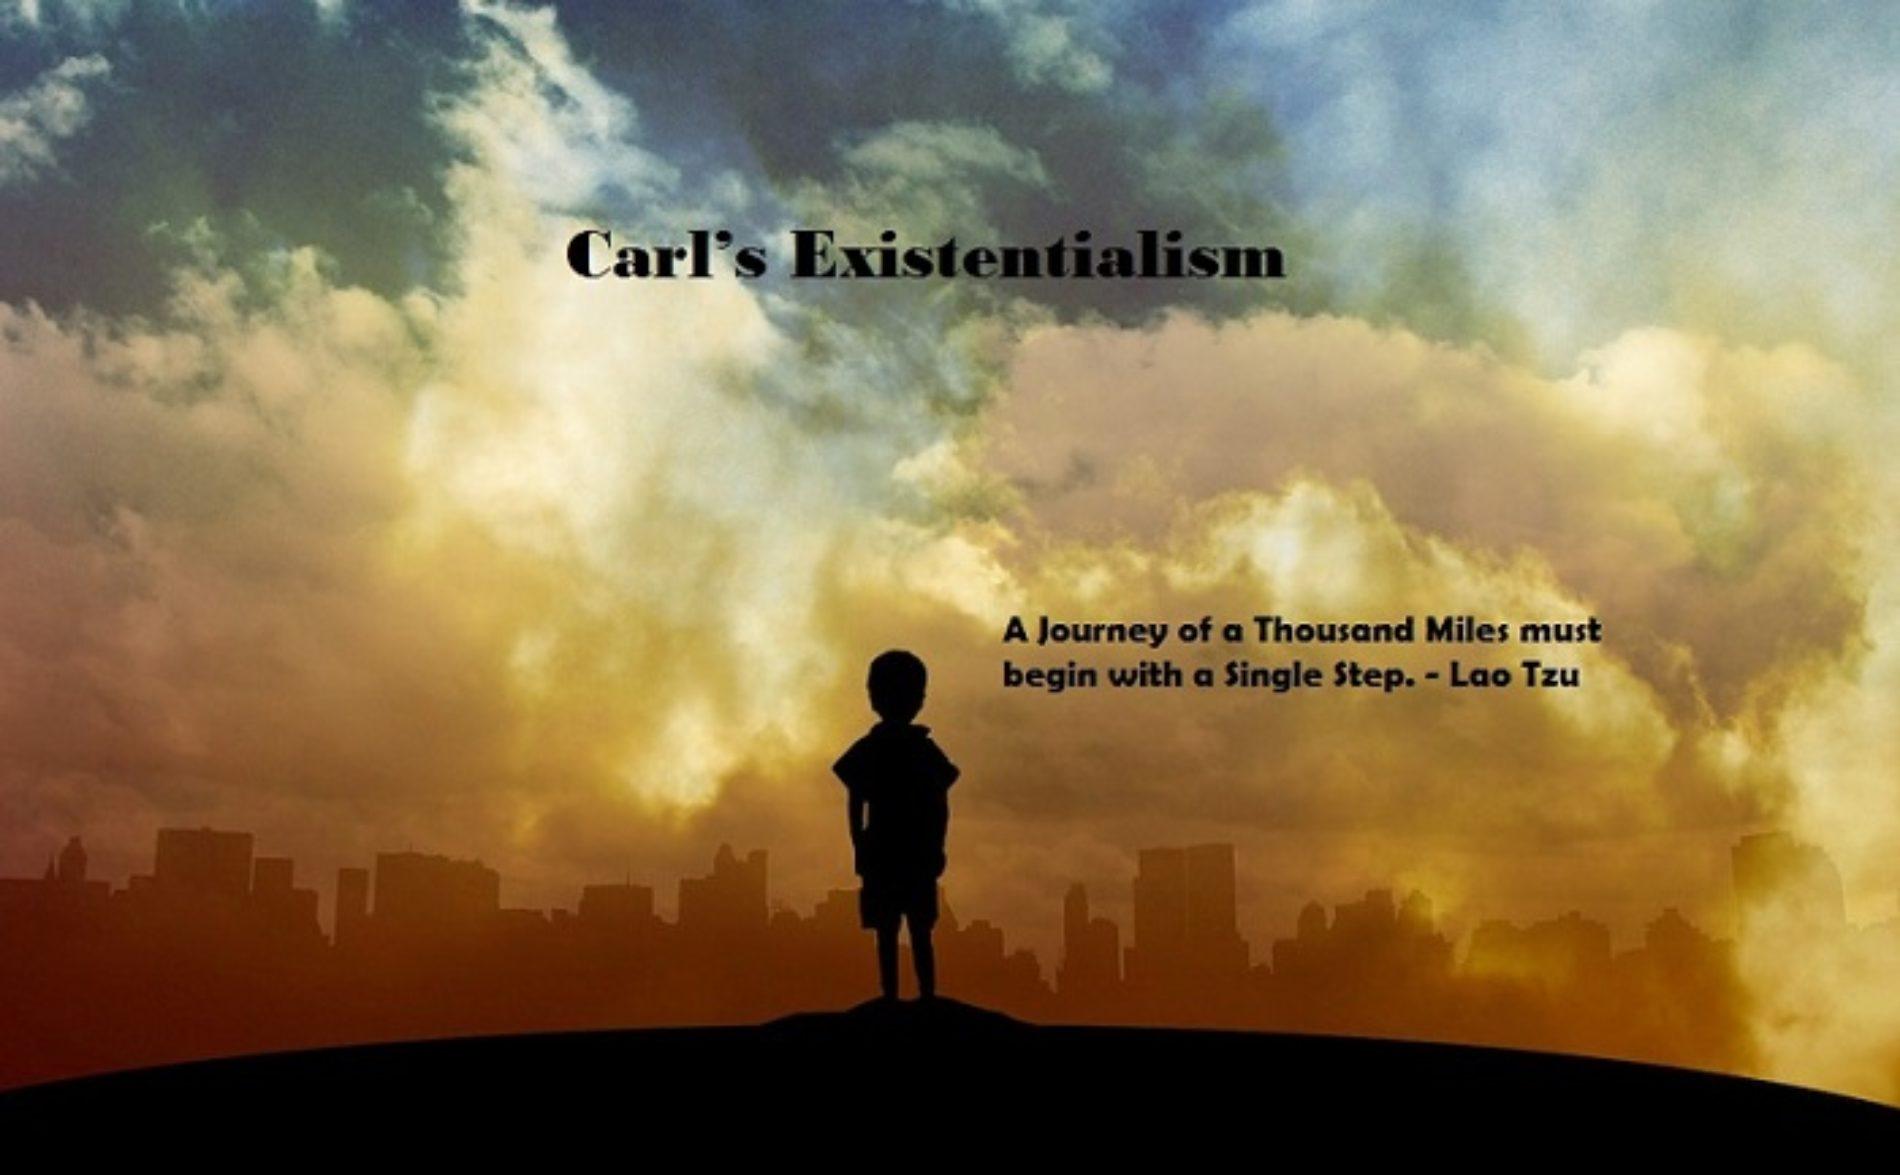 Carl's Existentialism VII